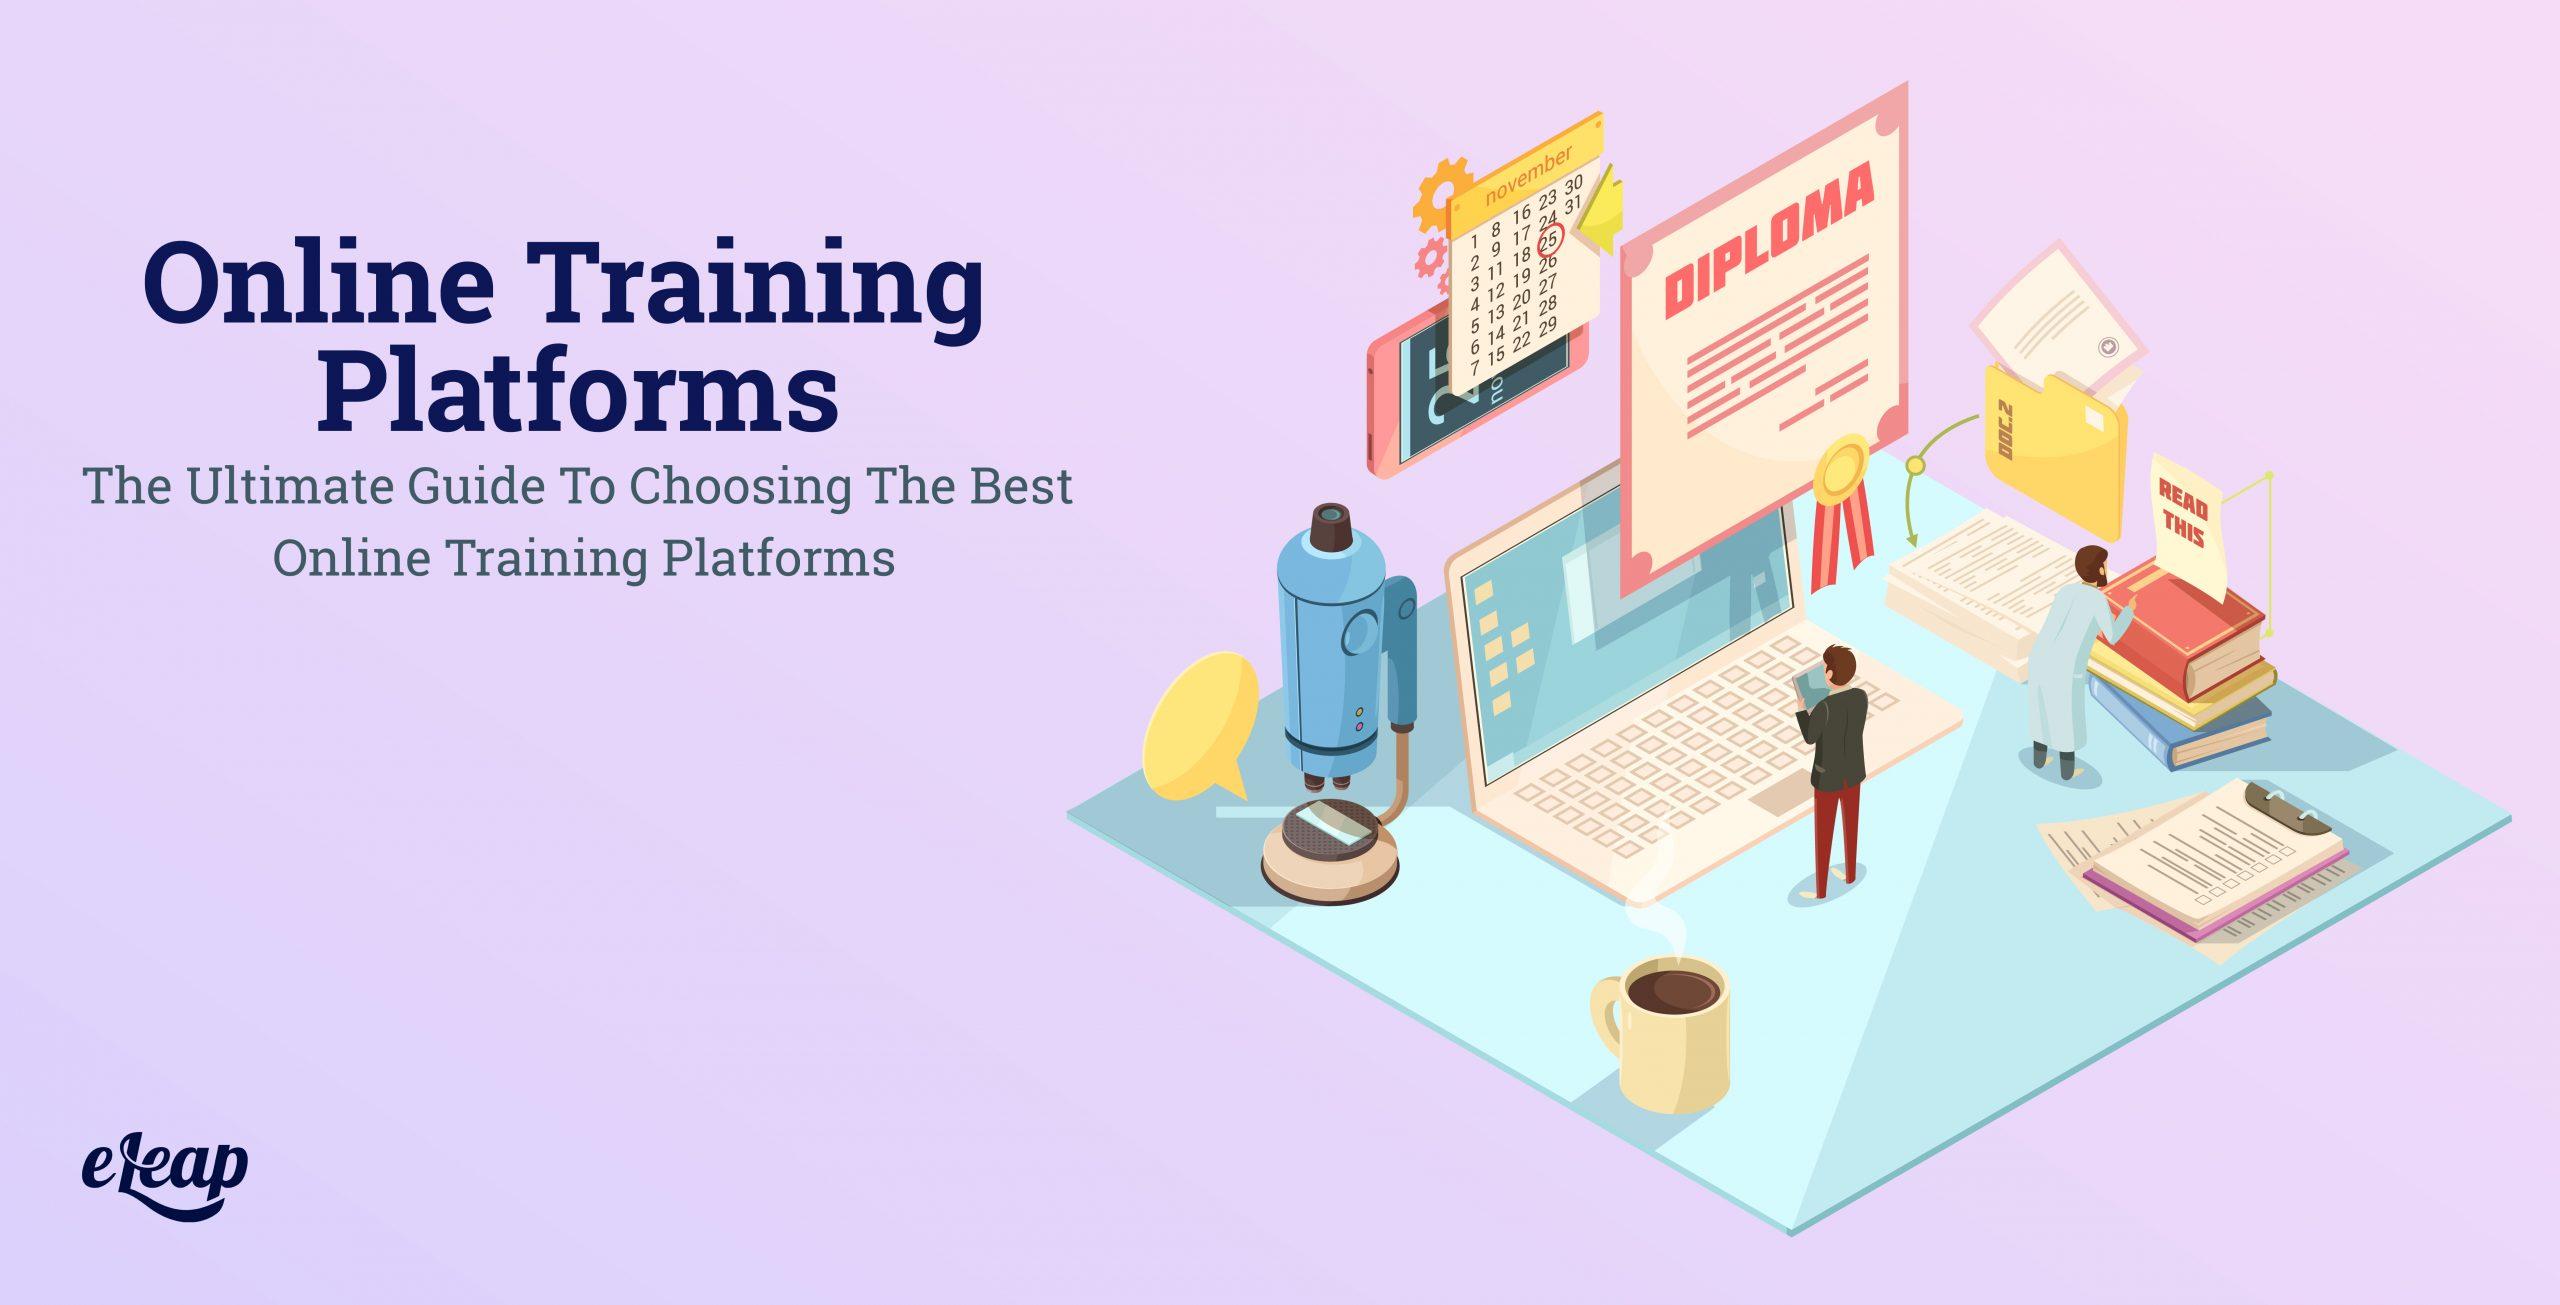 Online Training Platforms